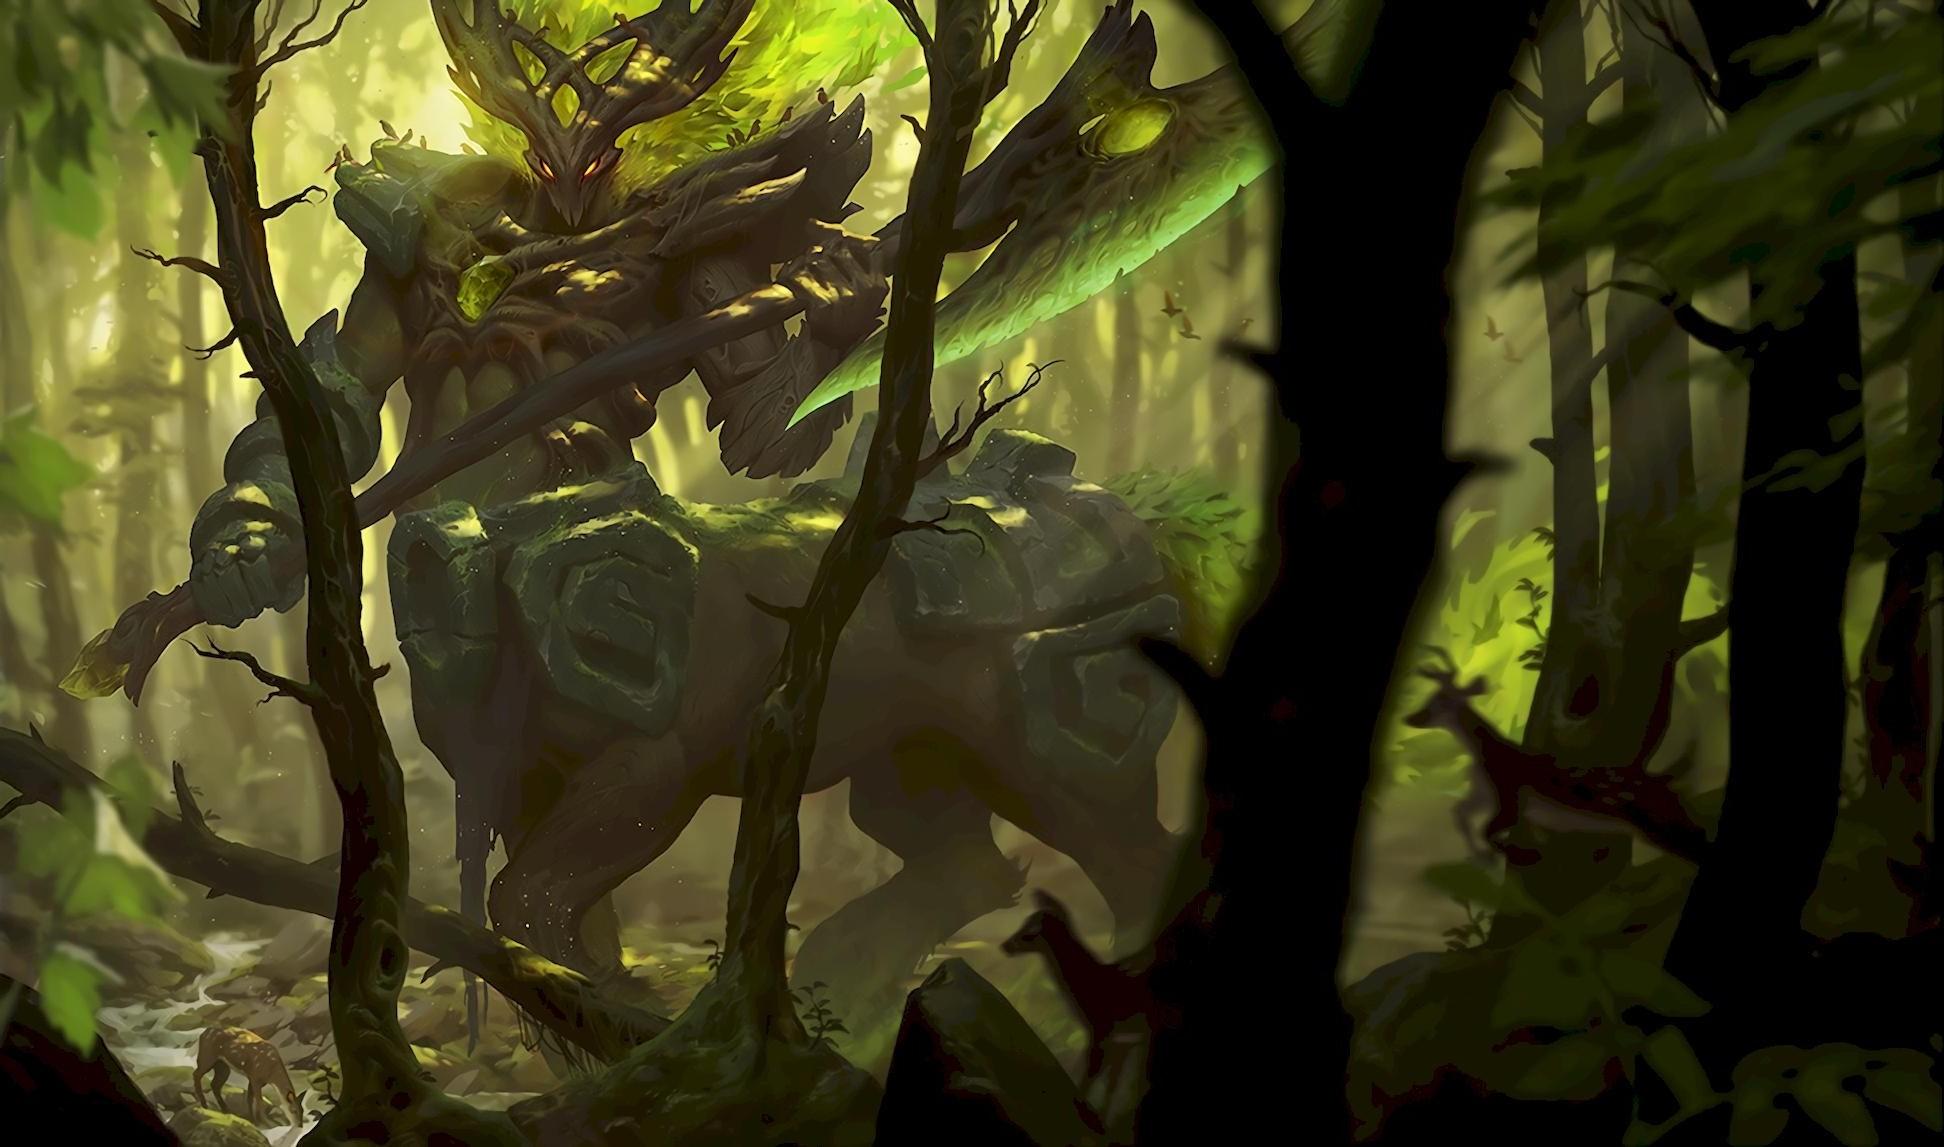 Fantasy Art, Centaur, Centaurs, League Of Legends, - League Of Legends Hecarim Forest , HD Wallpaper & Backgrounds